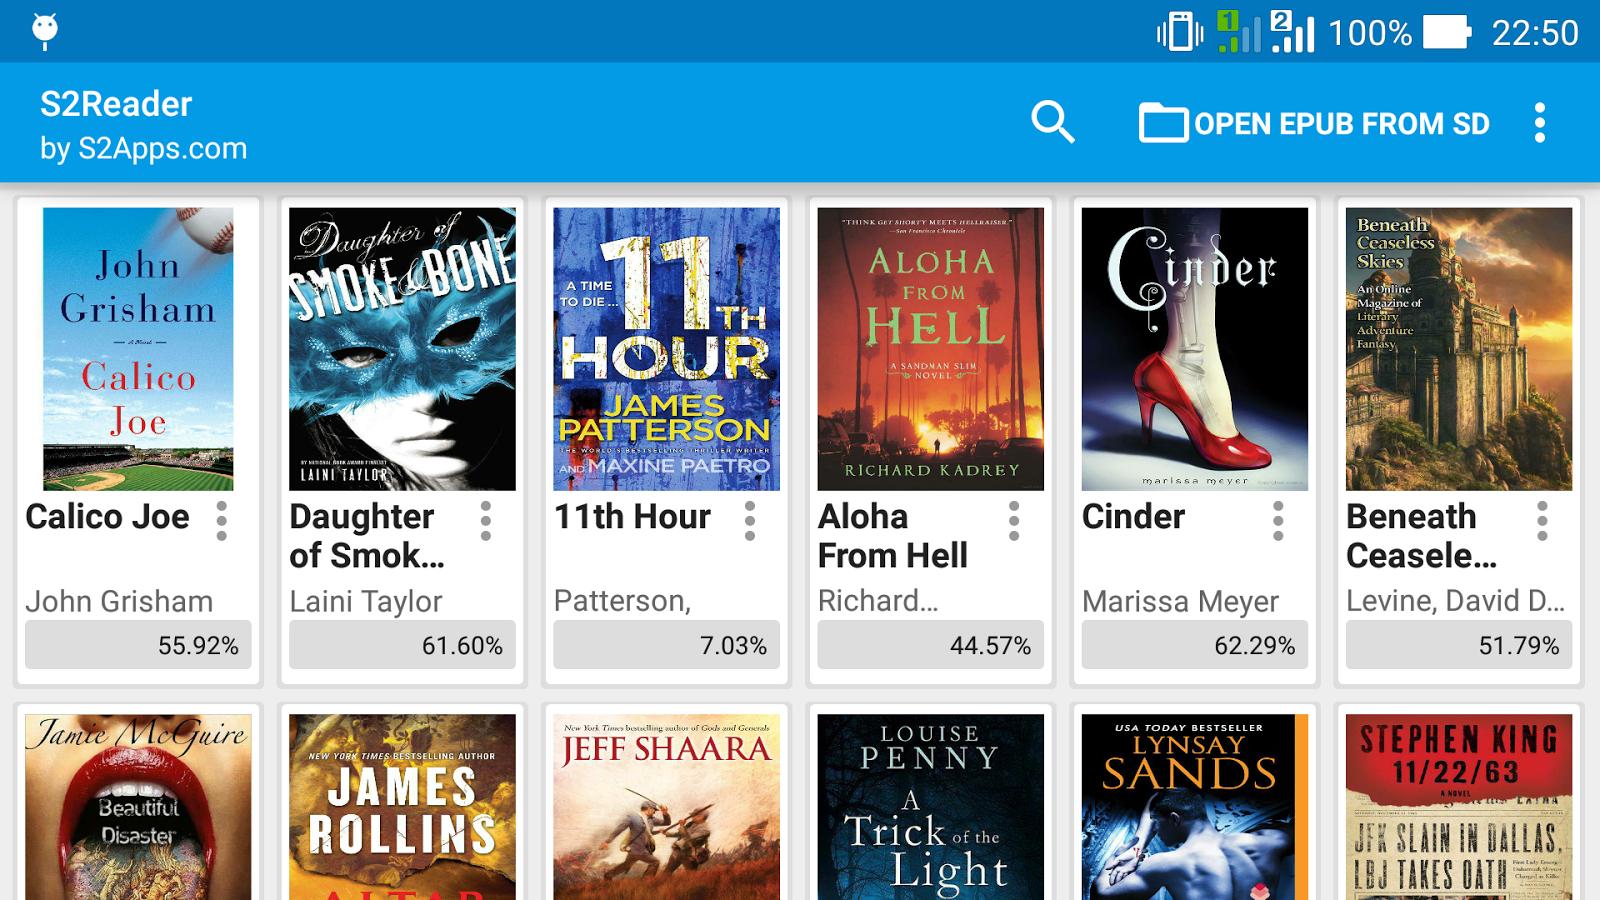 ePUB EBook Reader Skoob - Android Apps on Google Play